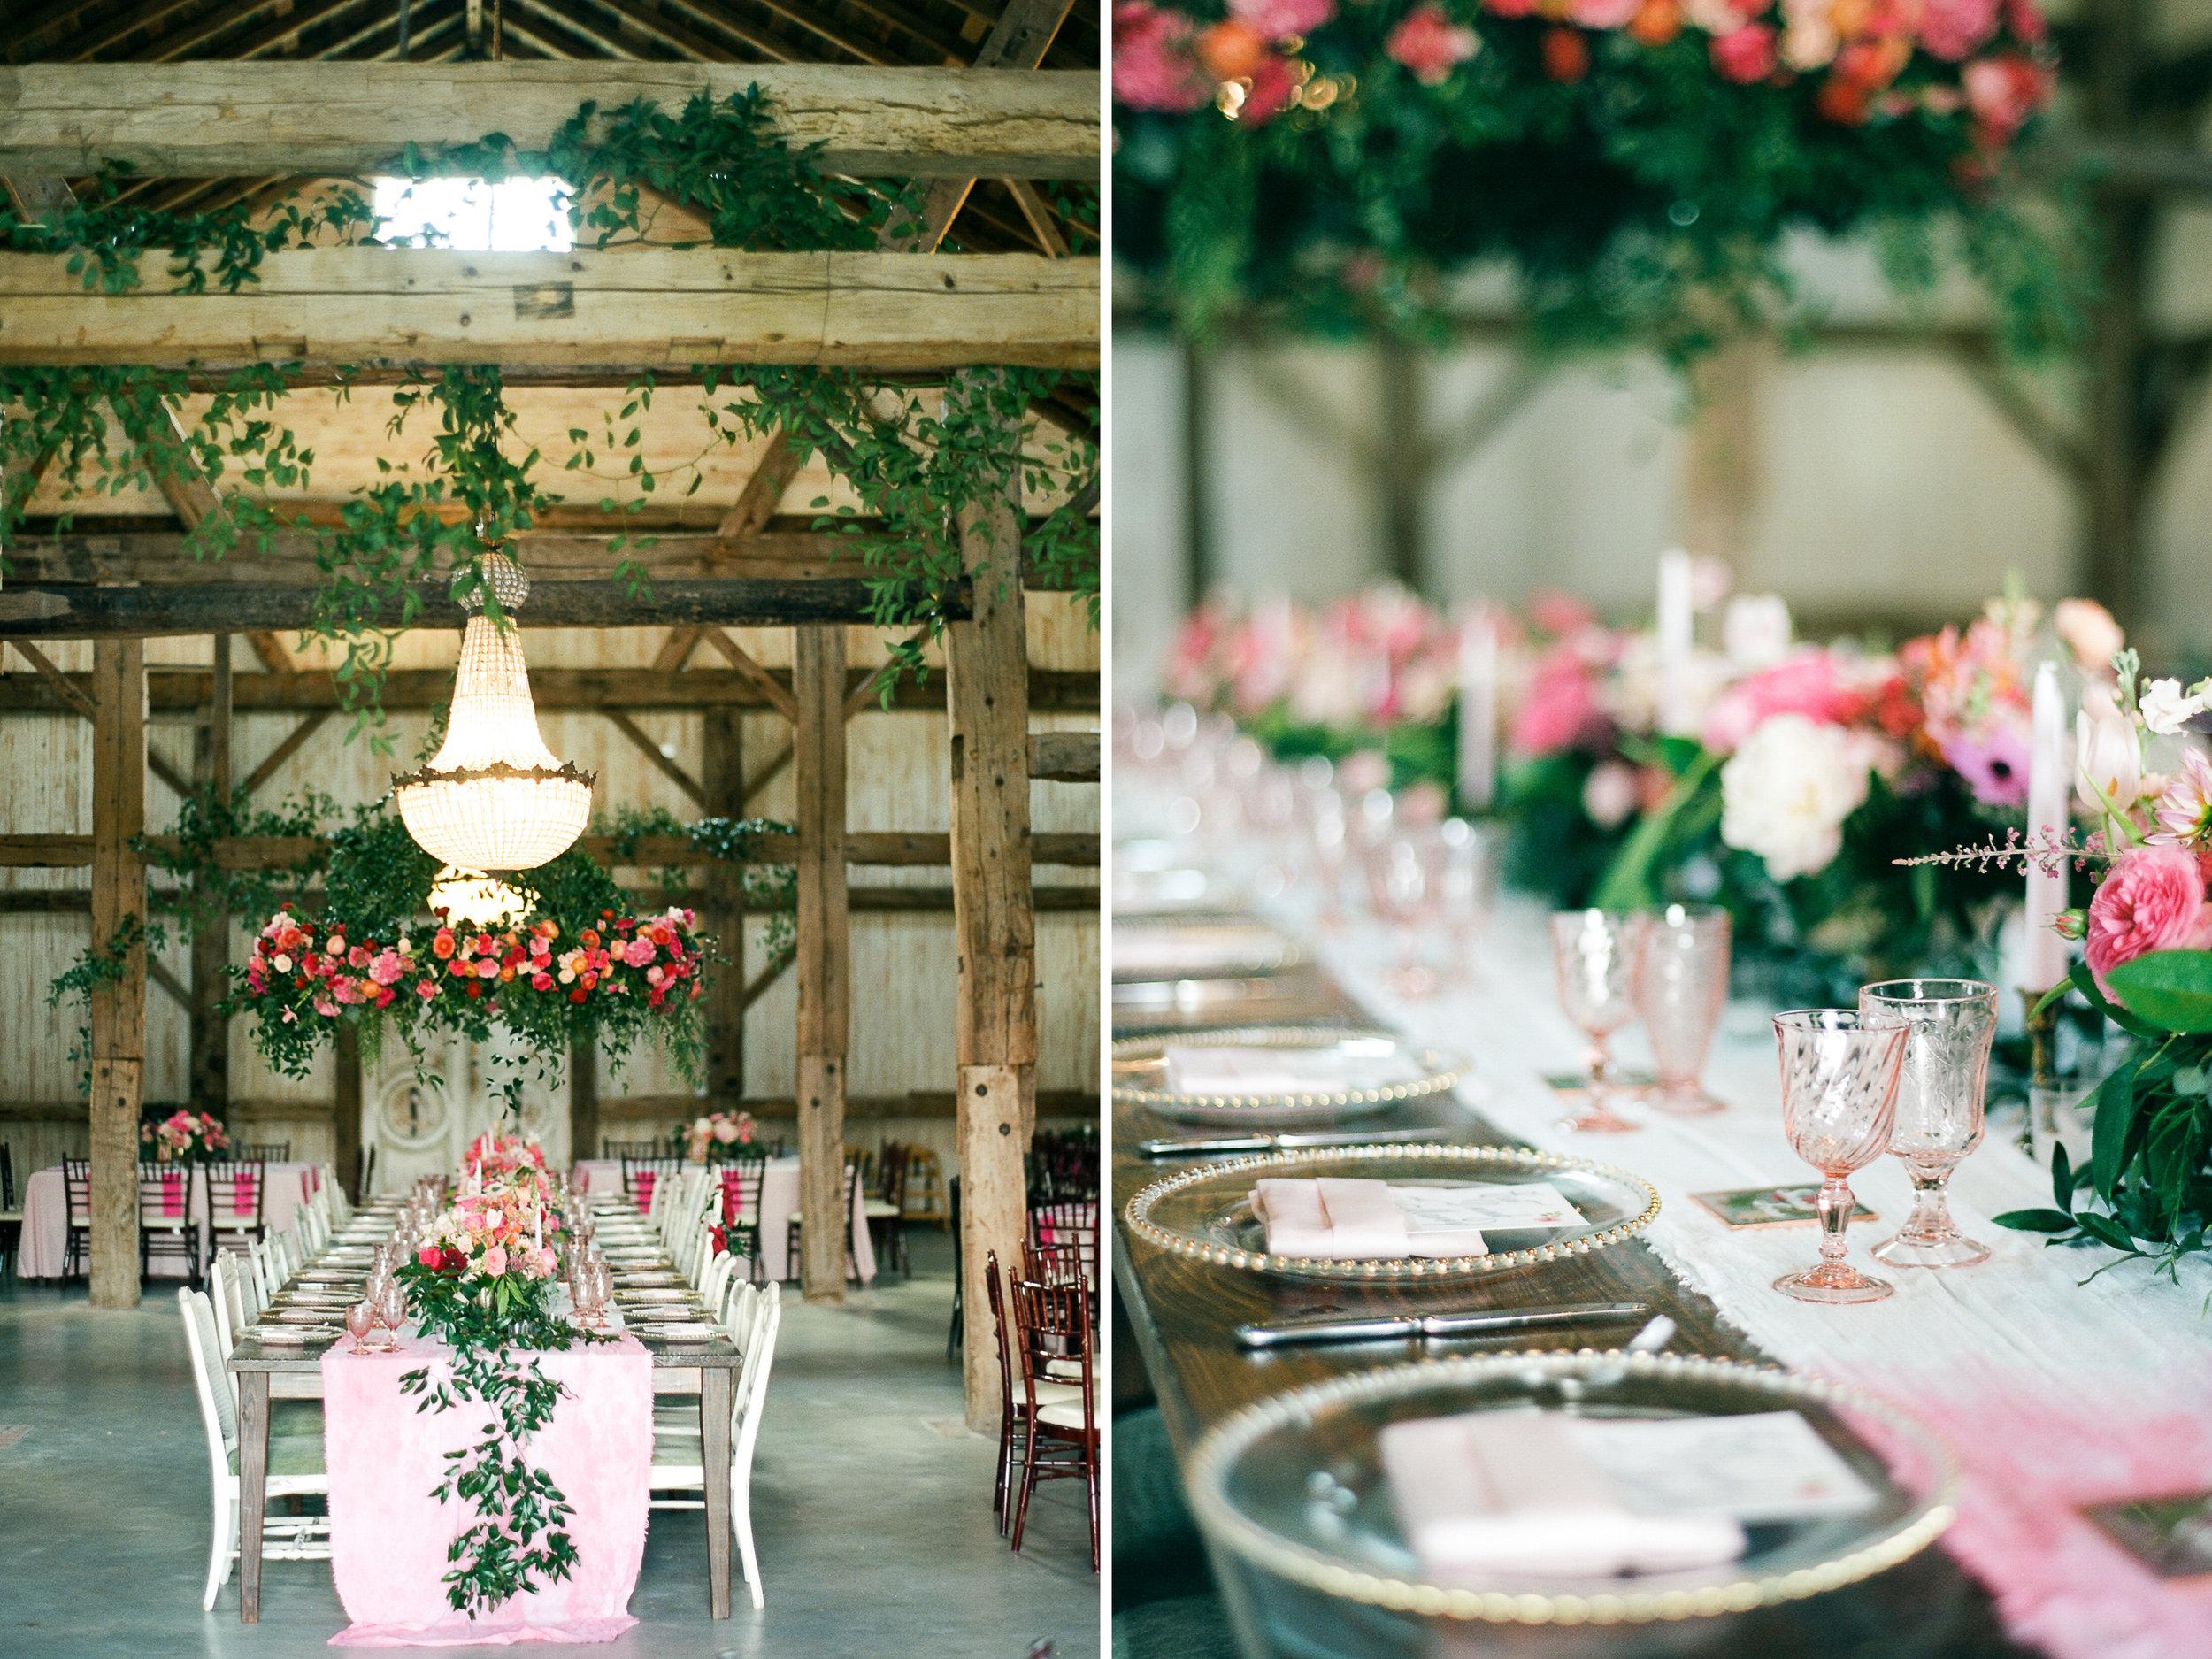 The-Knot-50-Weddings-50-States-Texas-Winner-Dana-Fernandez-photography-houston-wedding-photographer-film-fine-art-destination-181.jpg